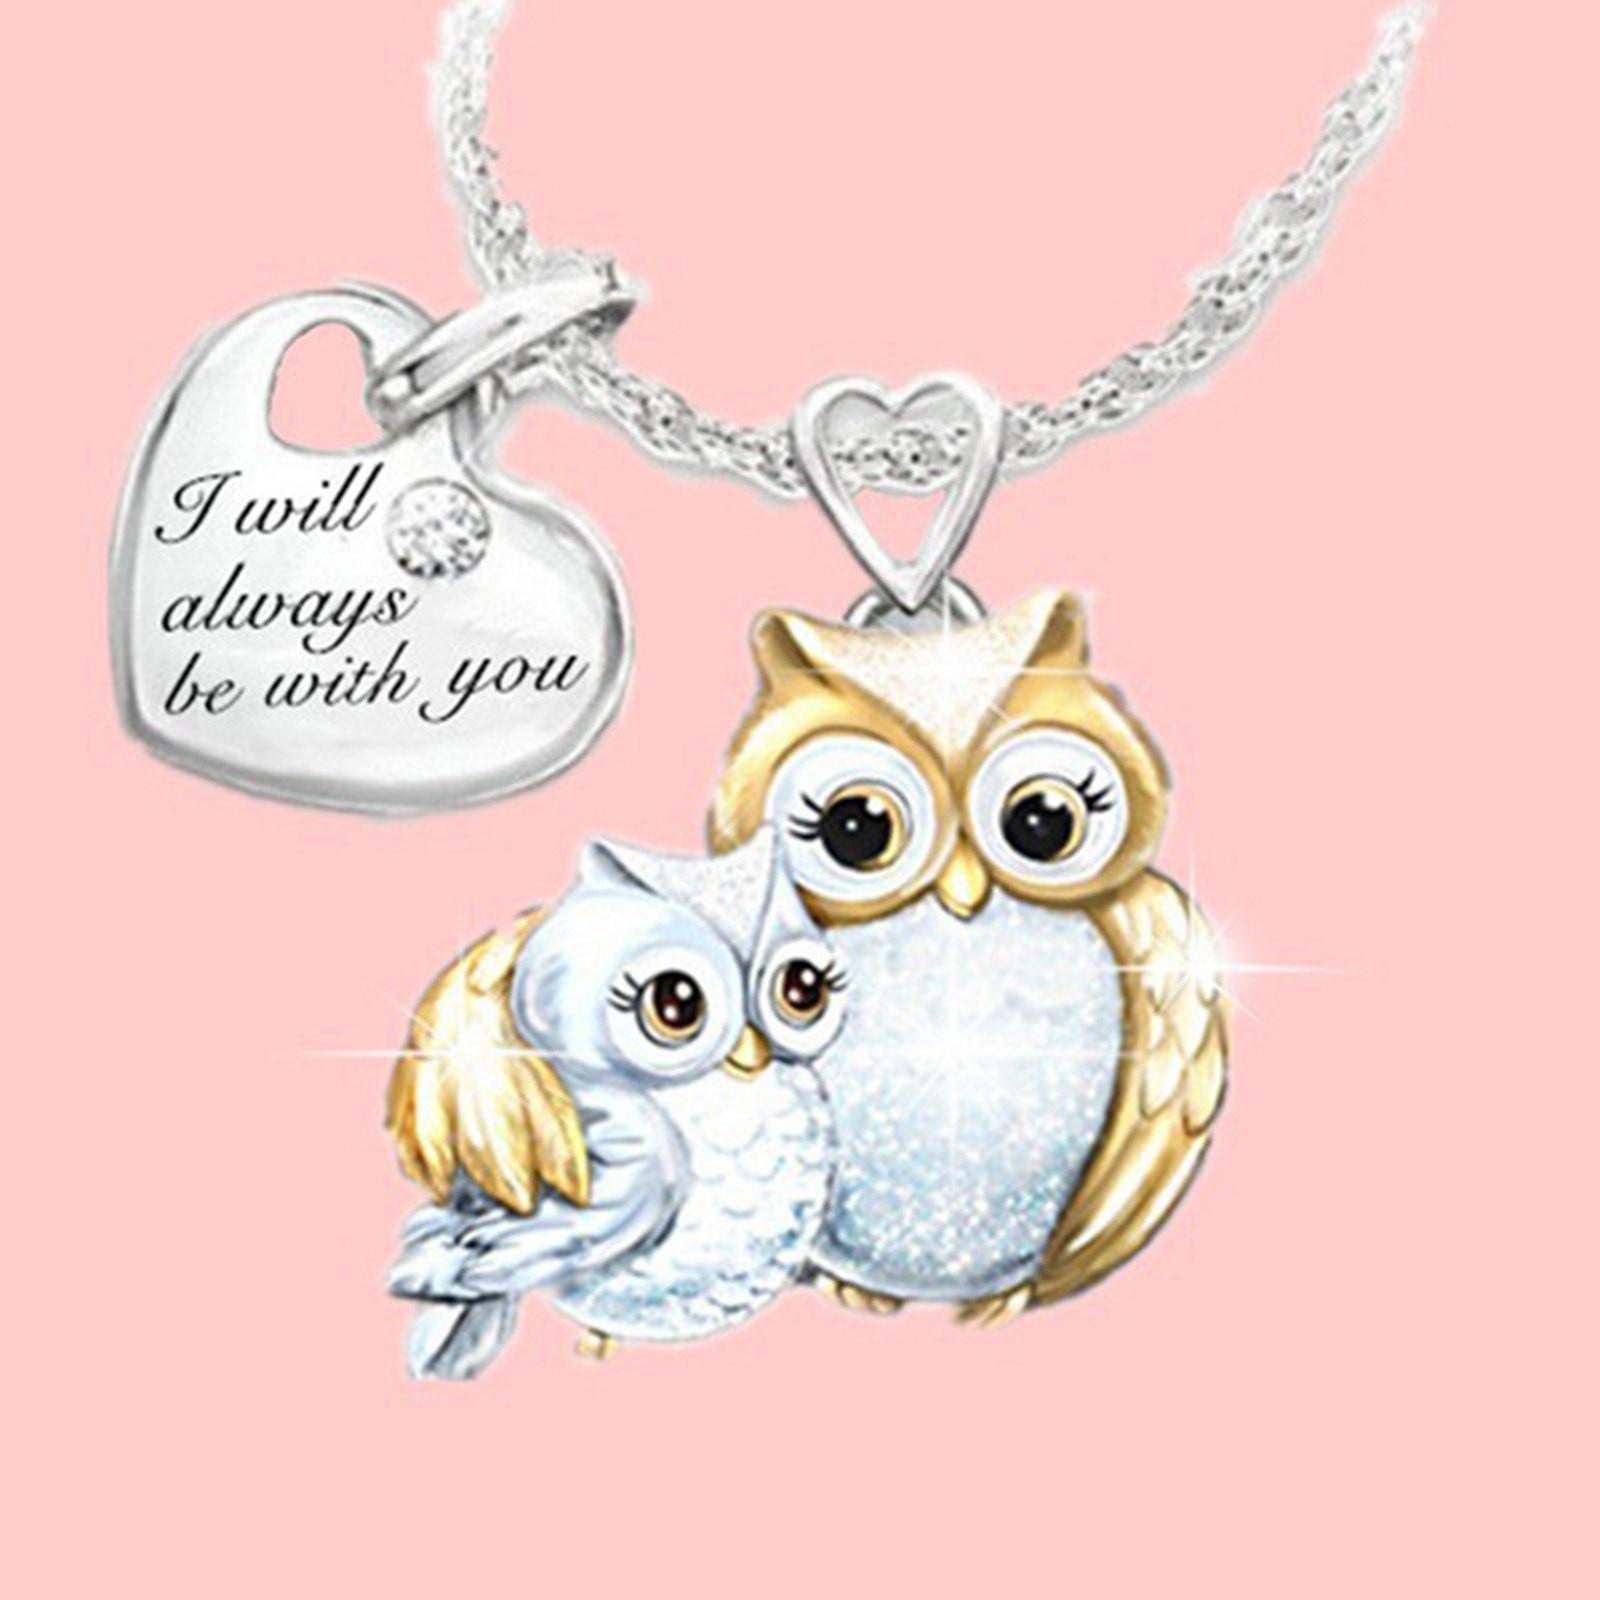 mandala dotpainting unique jewelry Handpainted chain pendant owl gift